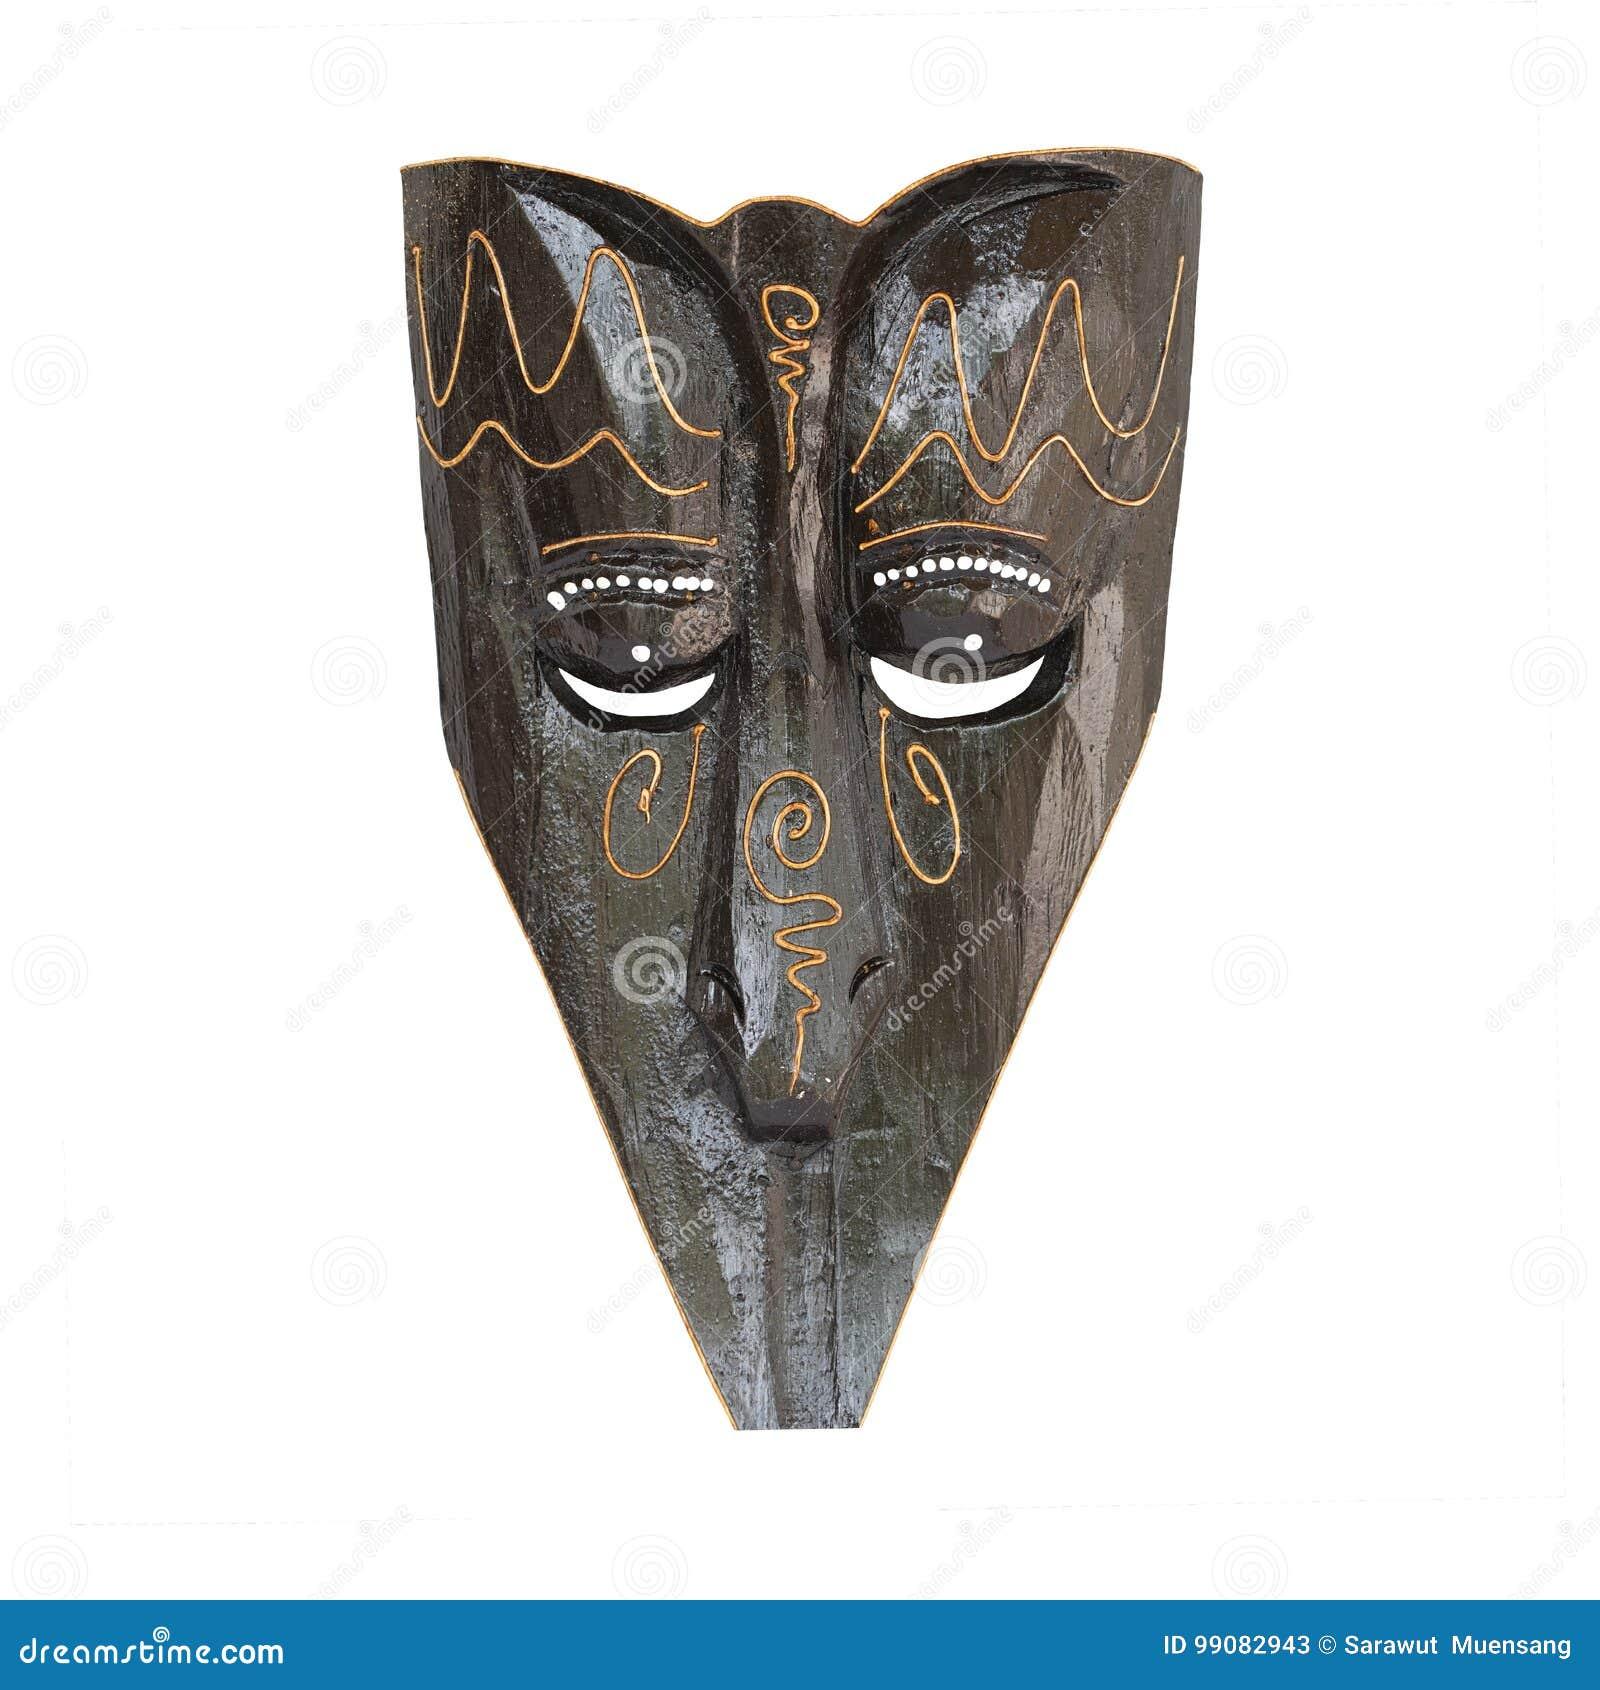 Indonesian Bali wooden mask